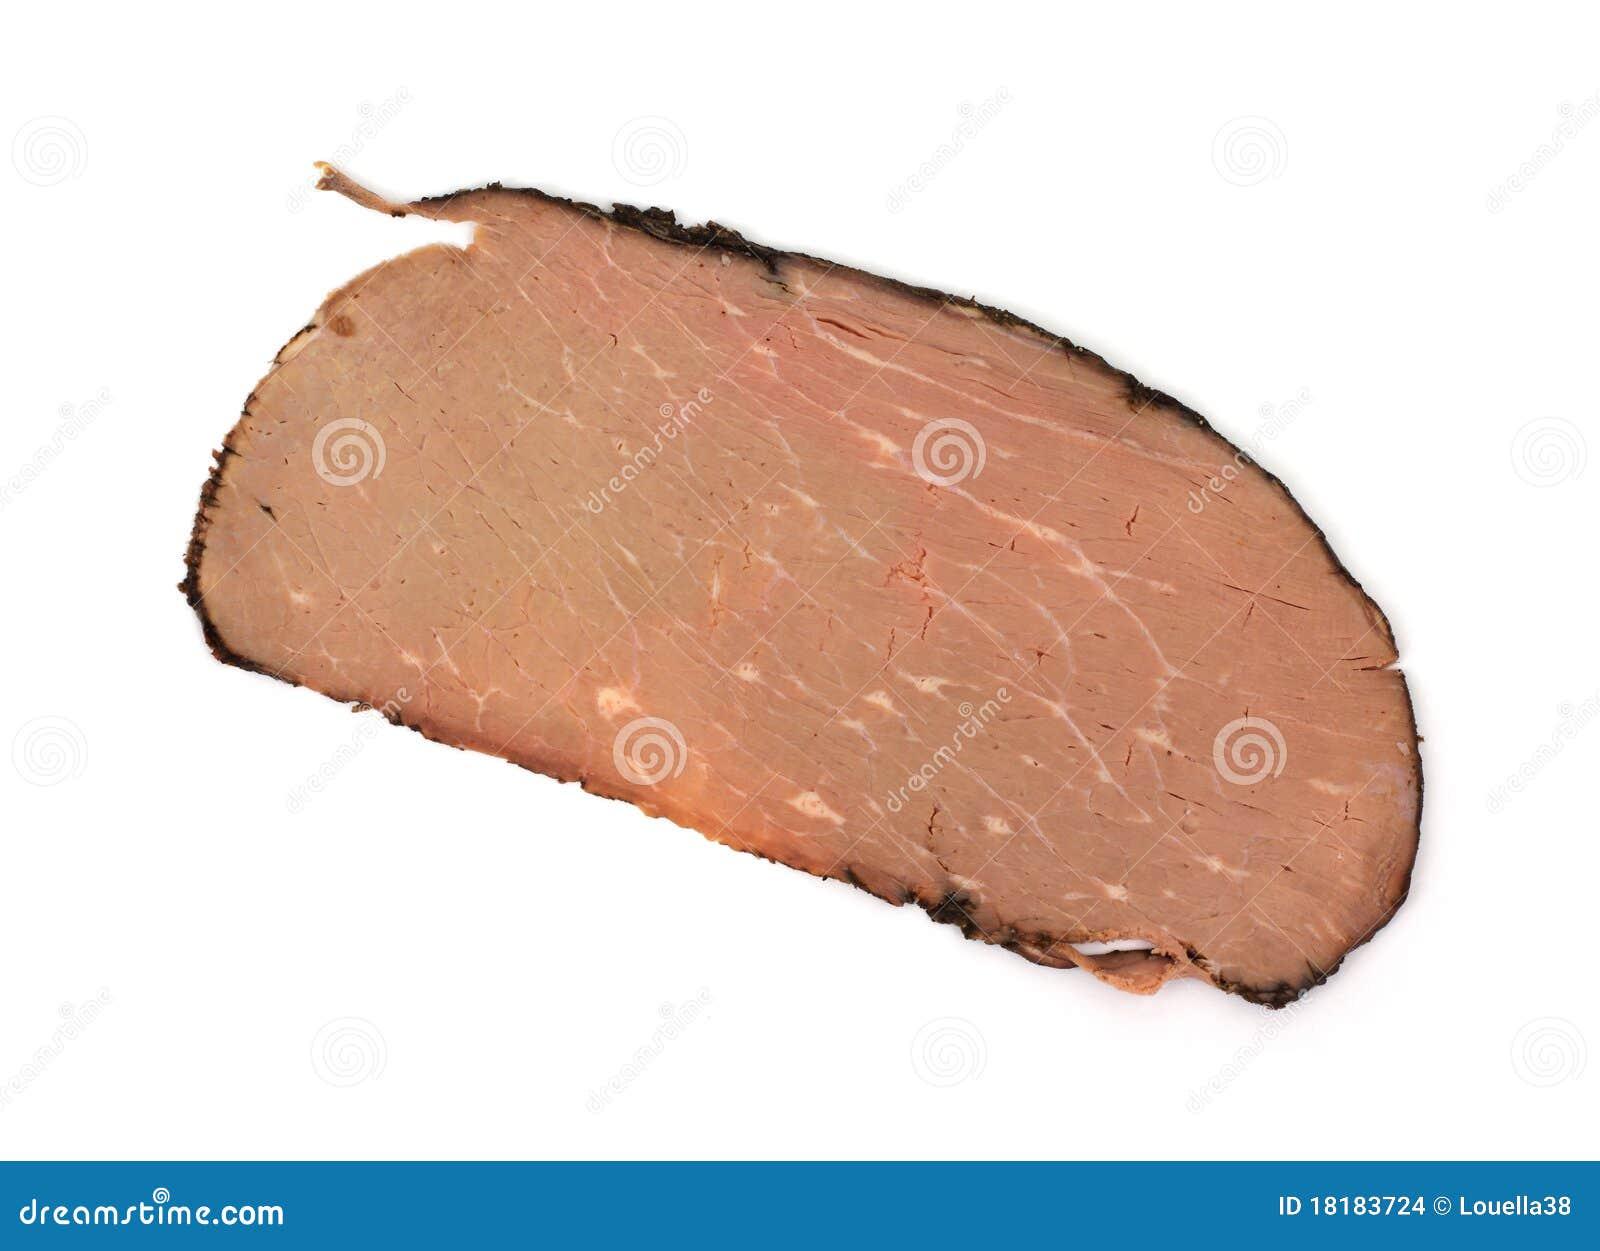 Sliced roast beef package - Single Slice Roast Beef